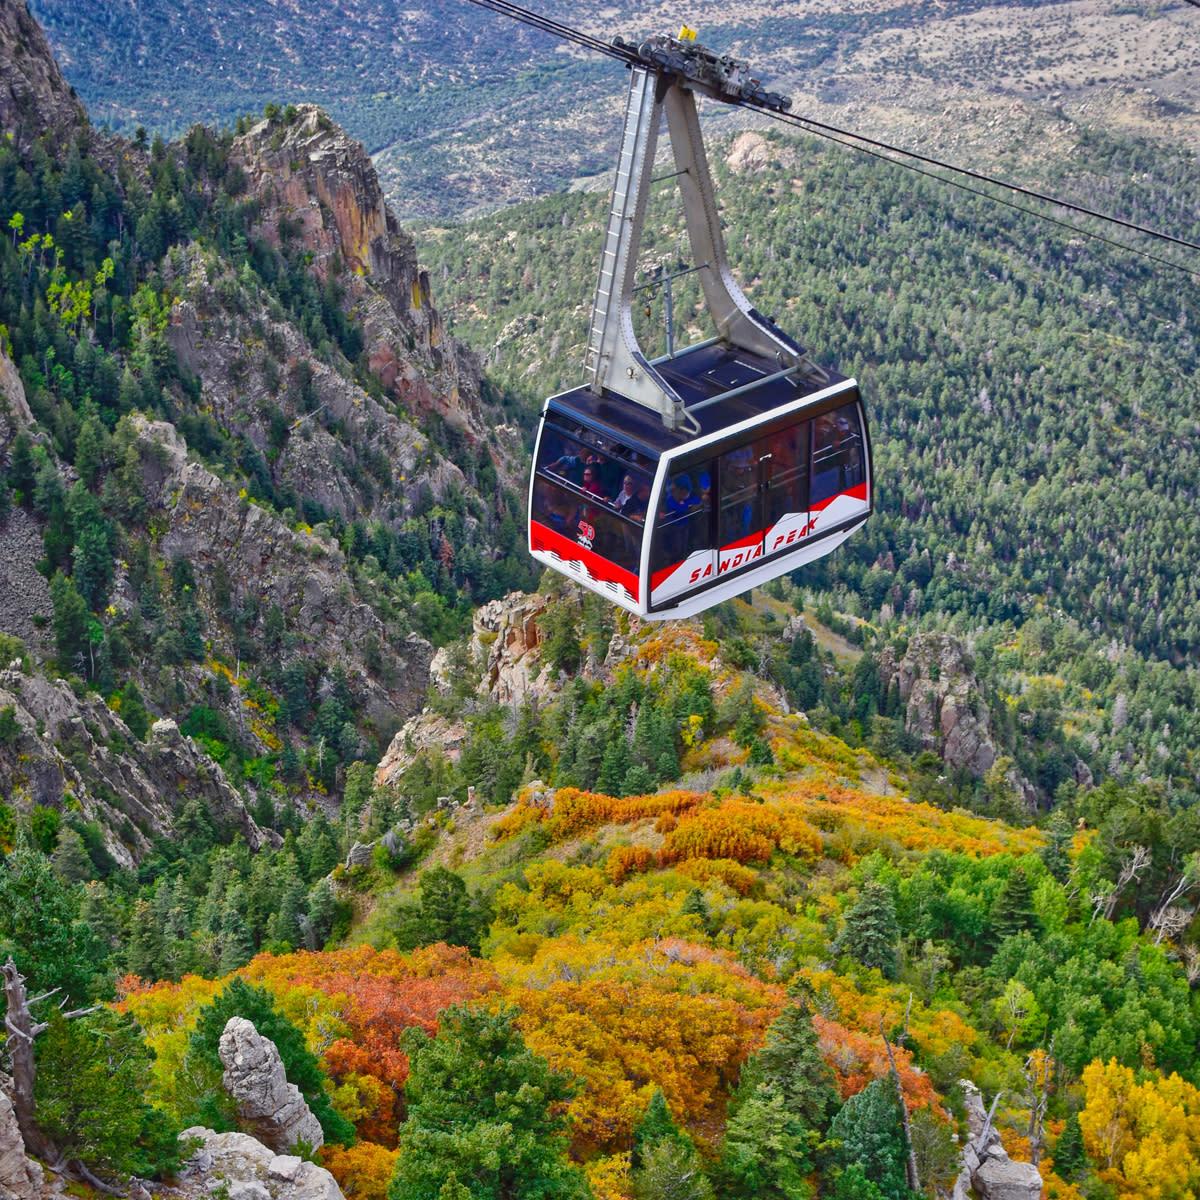 Sandia-Peak-Tram-70-97fceaa35056a36_97fcebd8-5056-a36a-09155d0828b21650.jpg